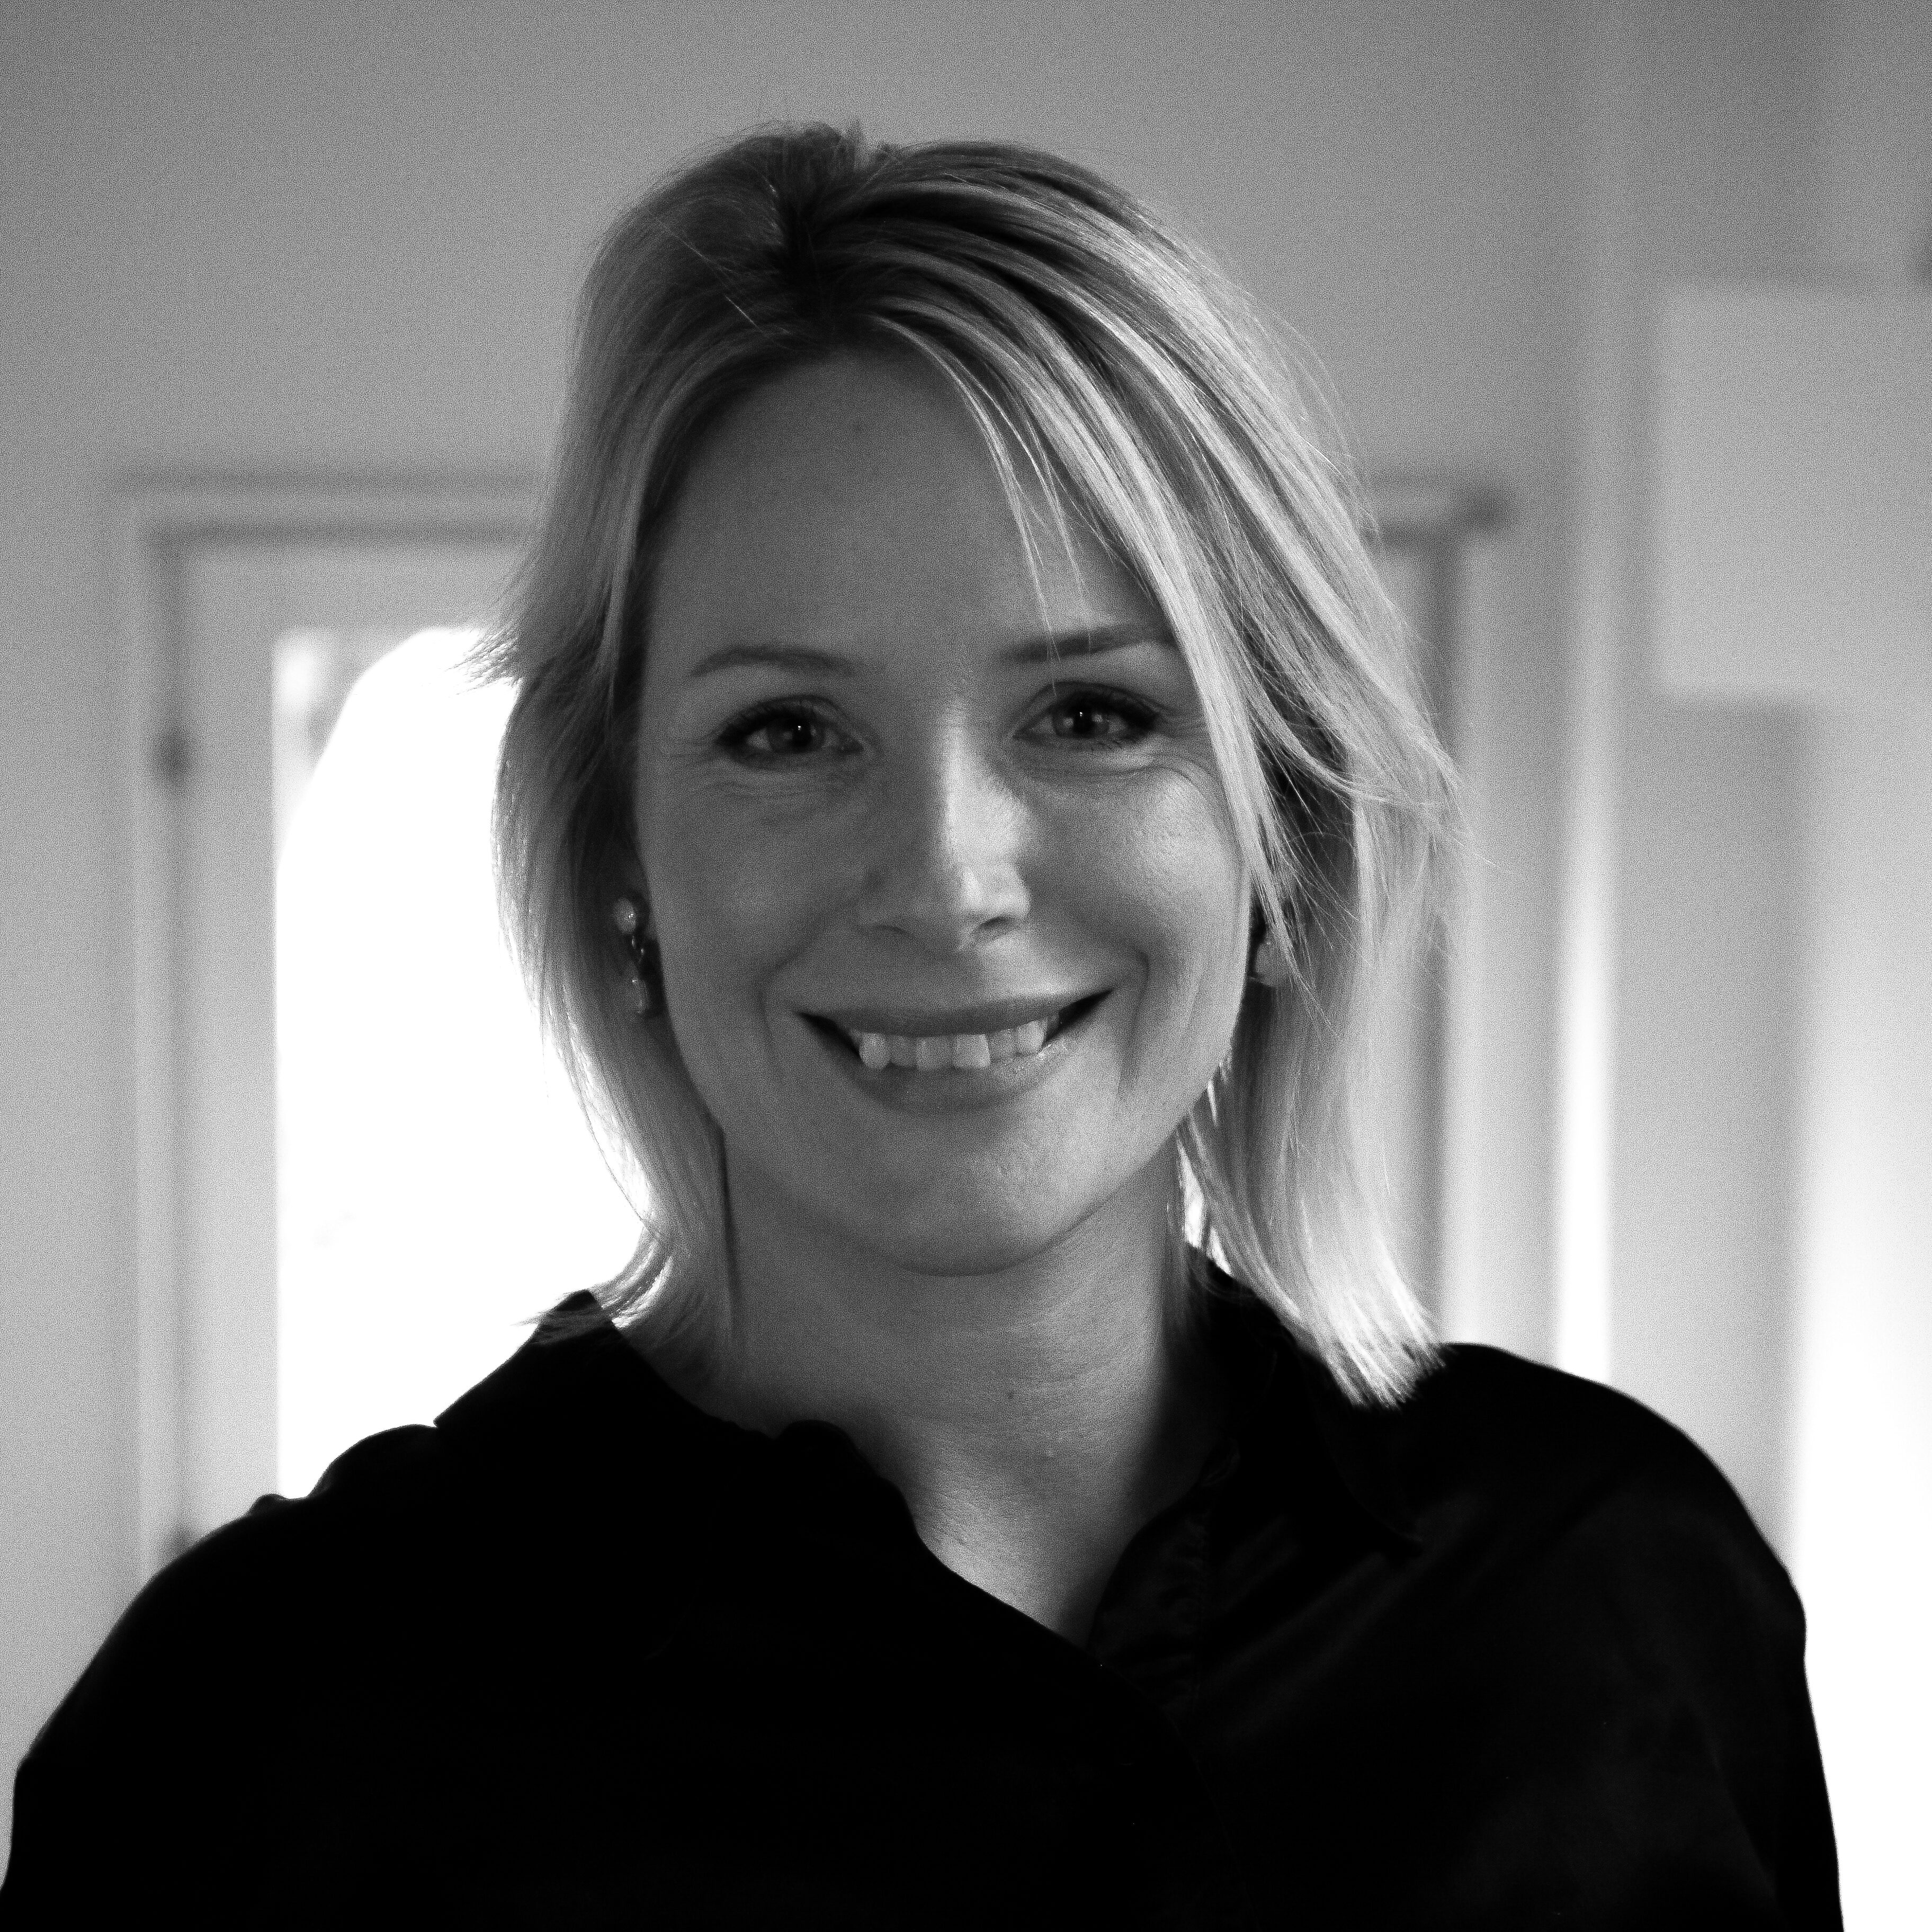 Louise Nollen